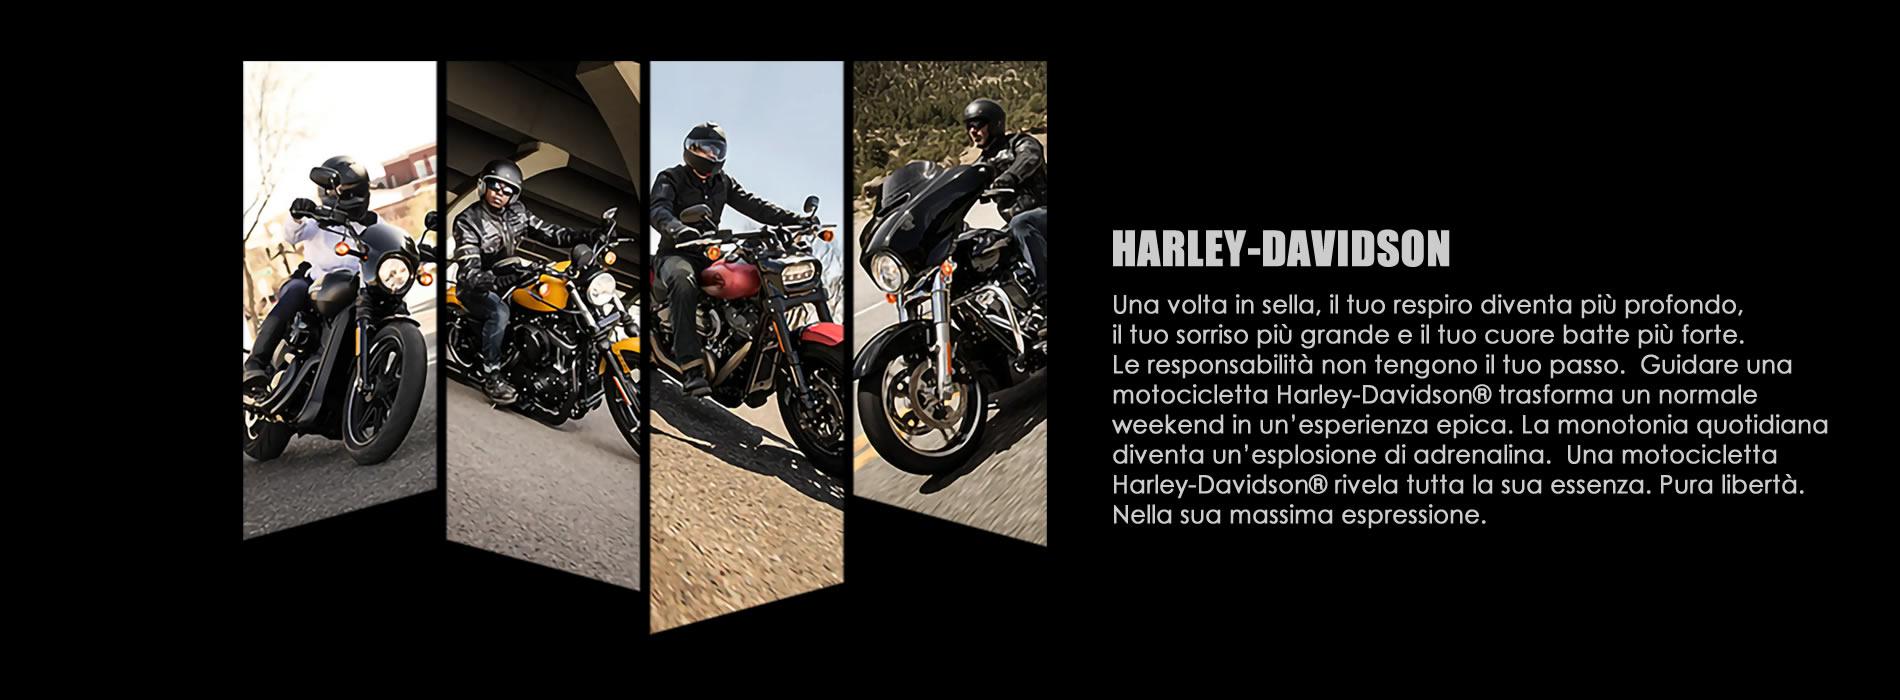 Harley-Davidson 2020